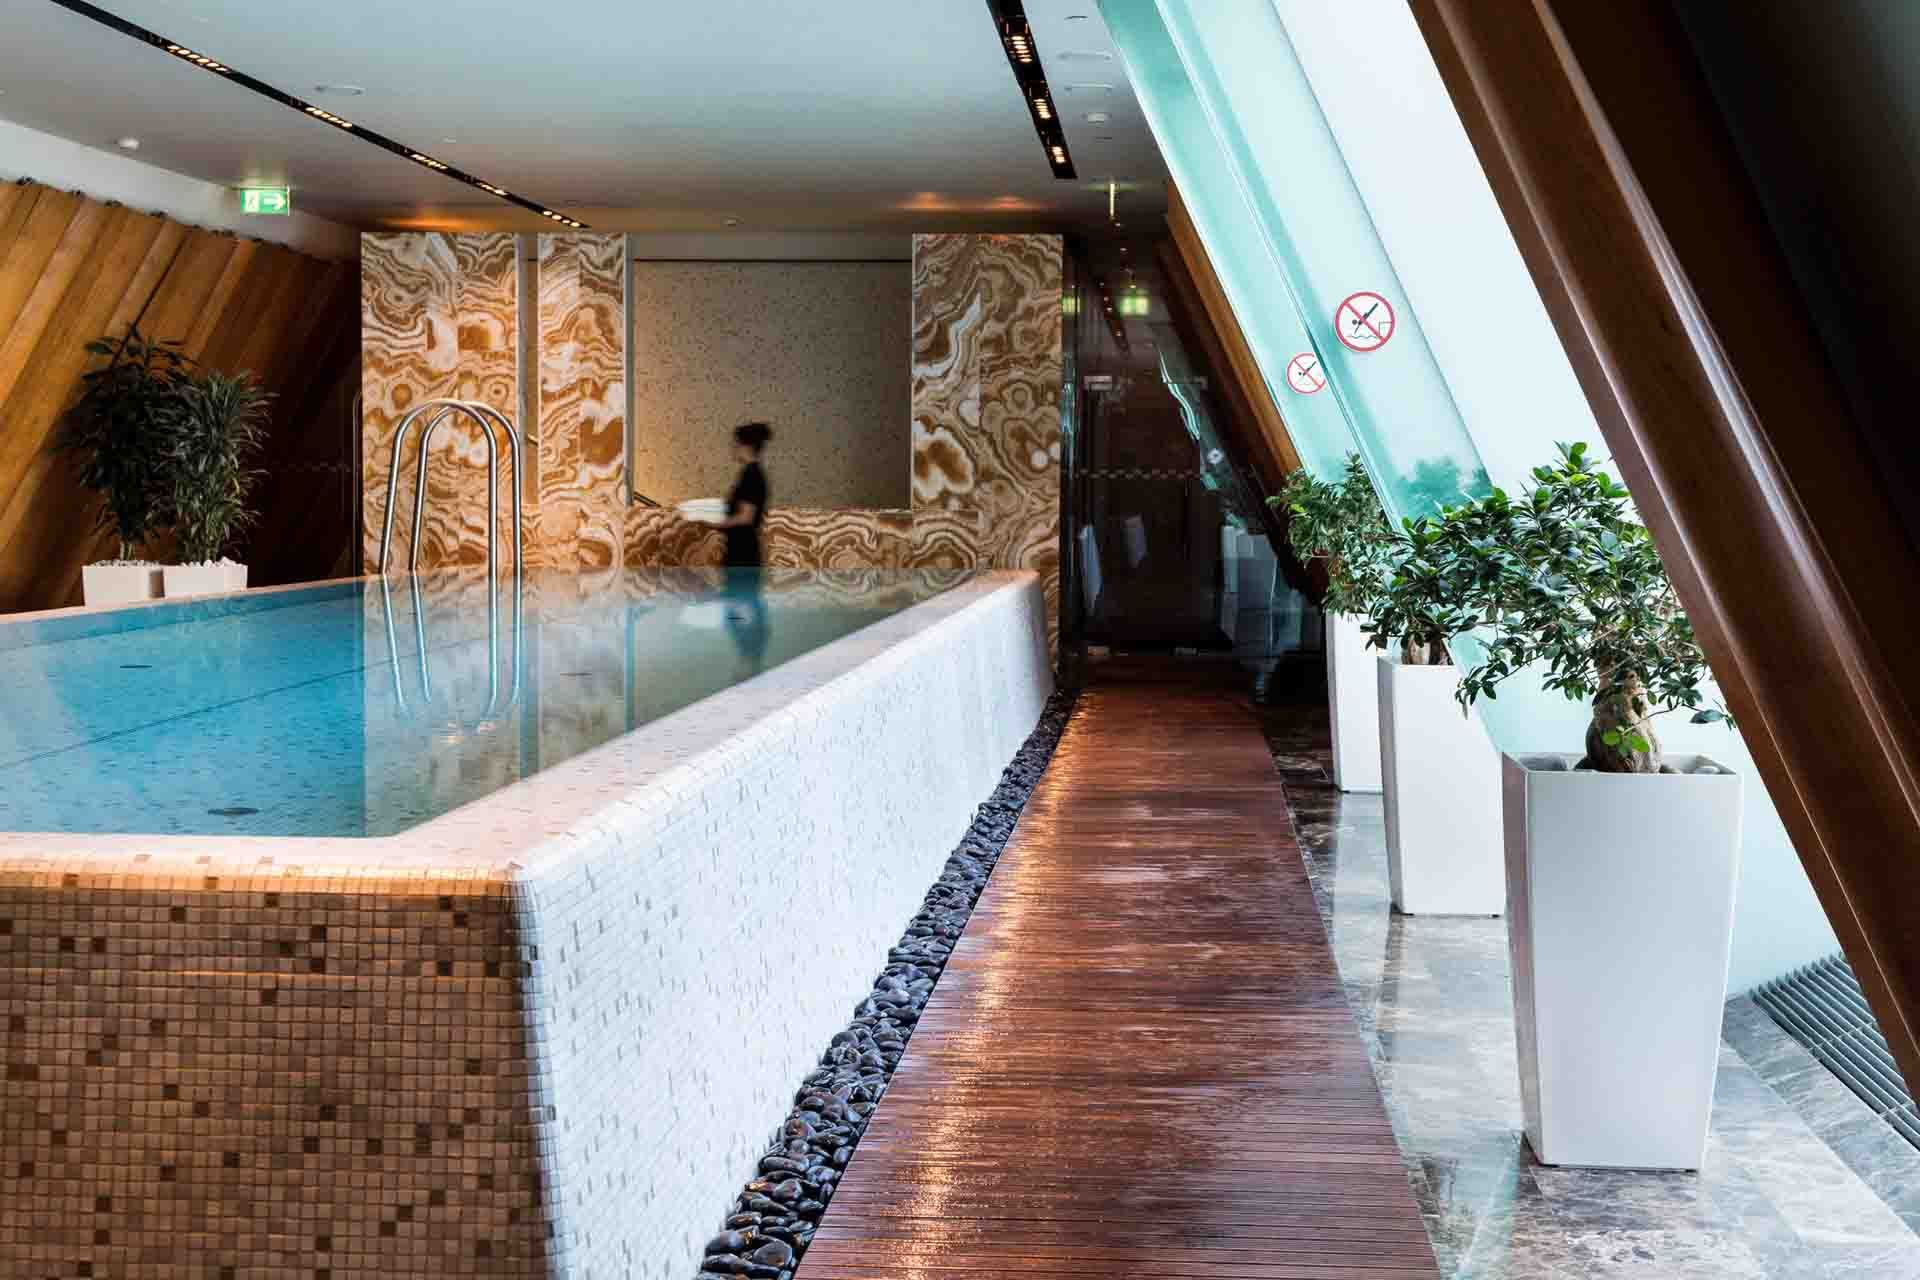 6a098037b8a22df1850bd1549753f13a - City Gardens Hotel And Wellness Budapest